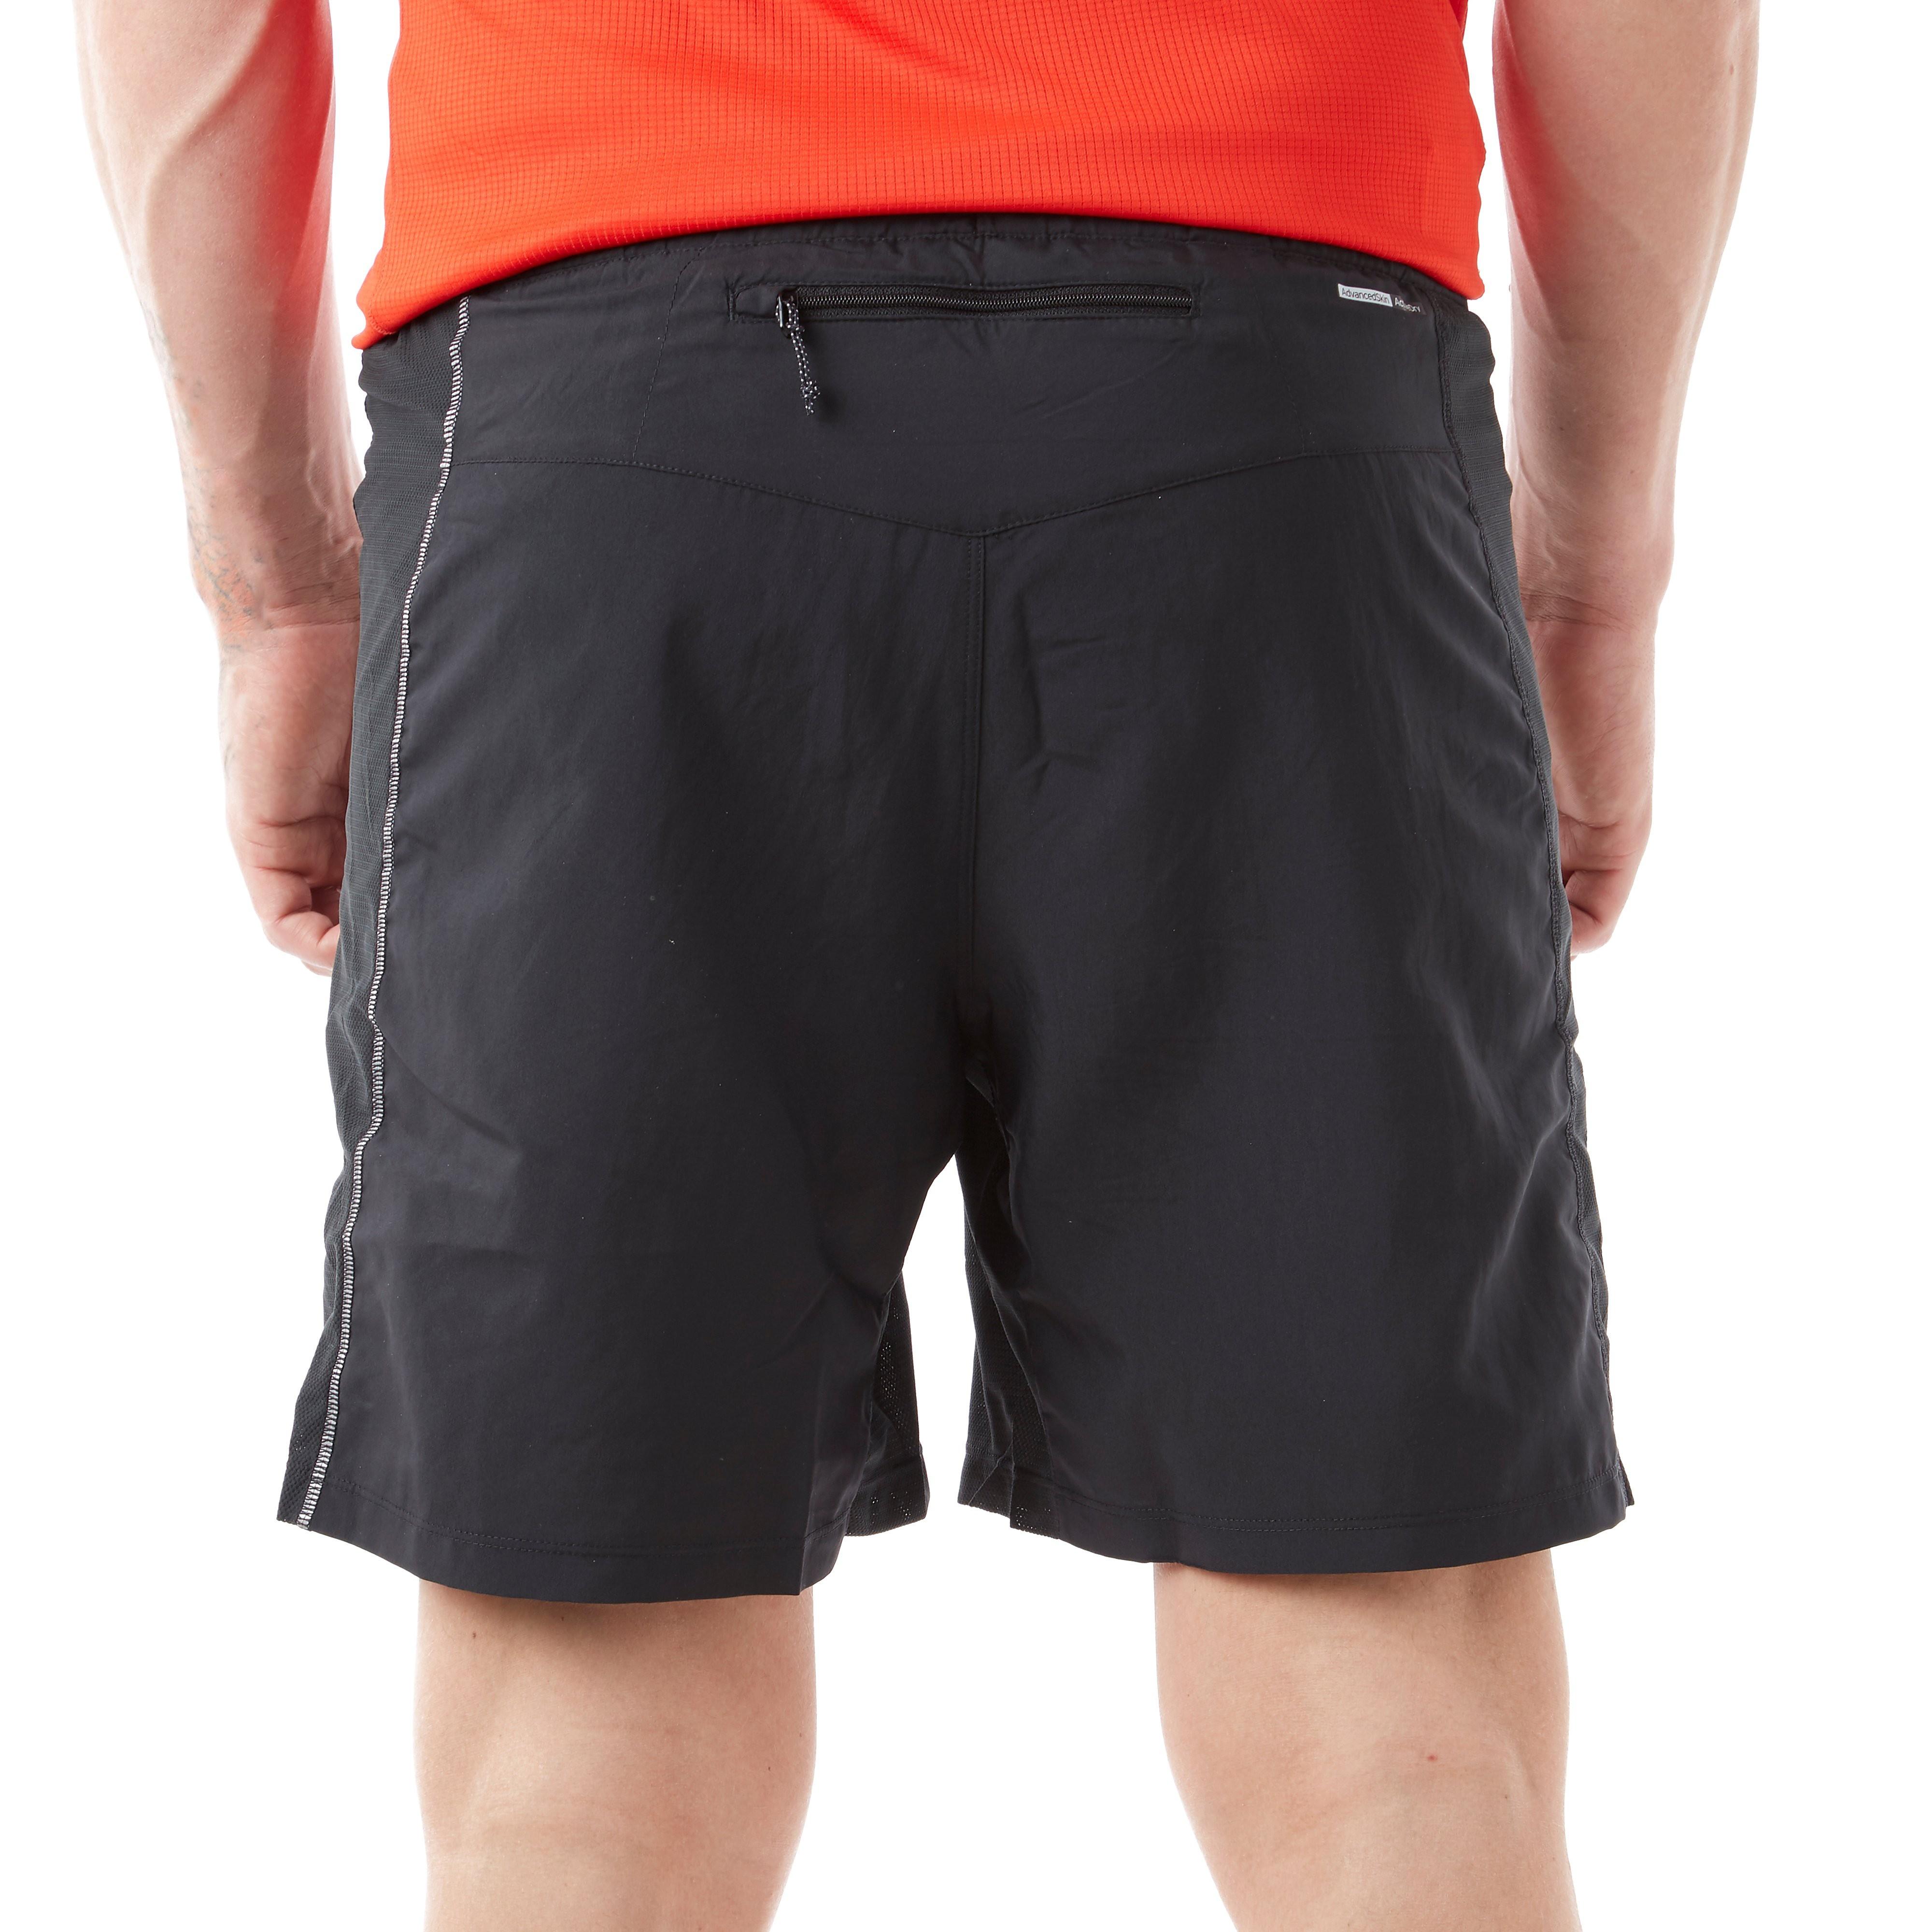 "Salomon Agile 7"" Men's Trail Running Short"